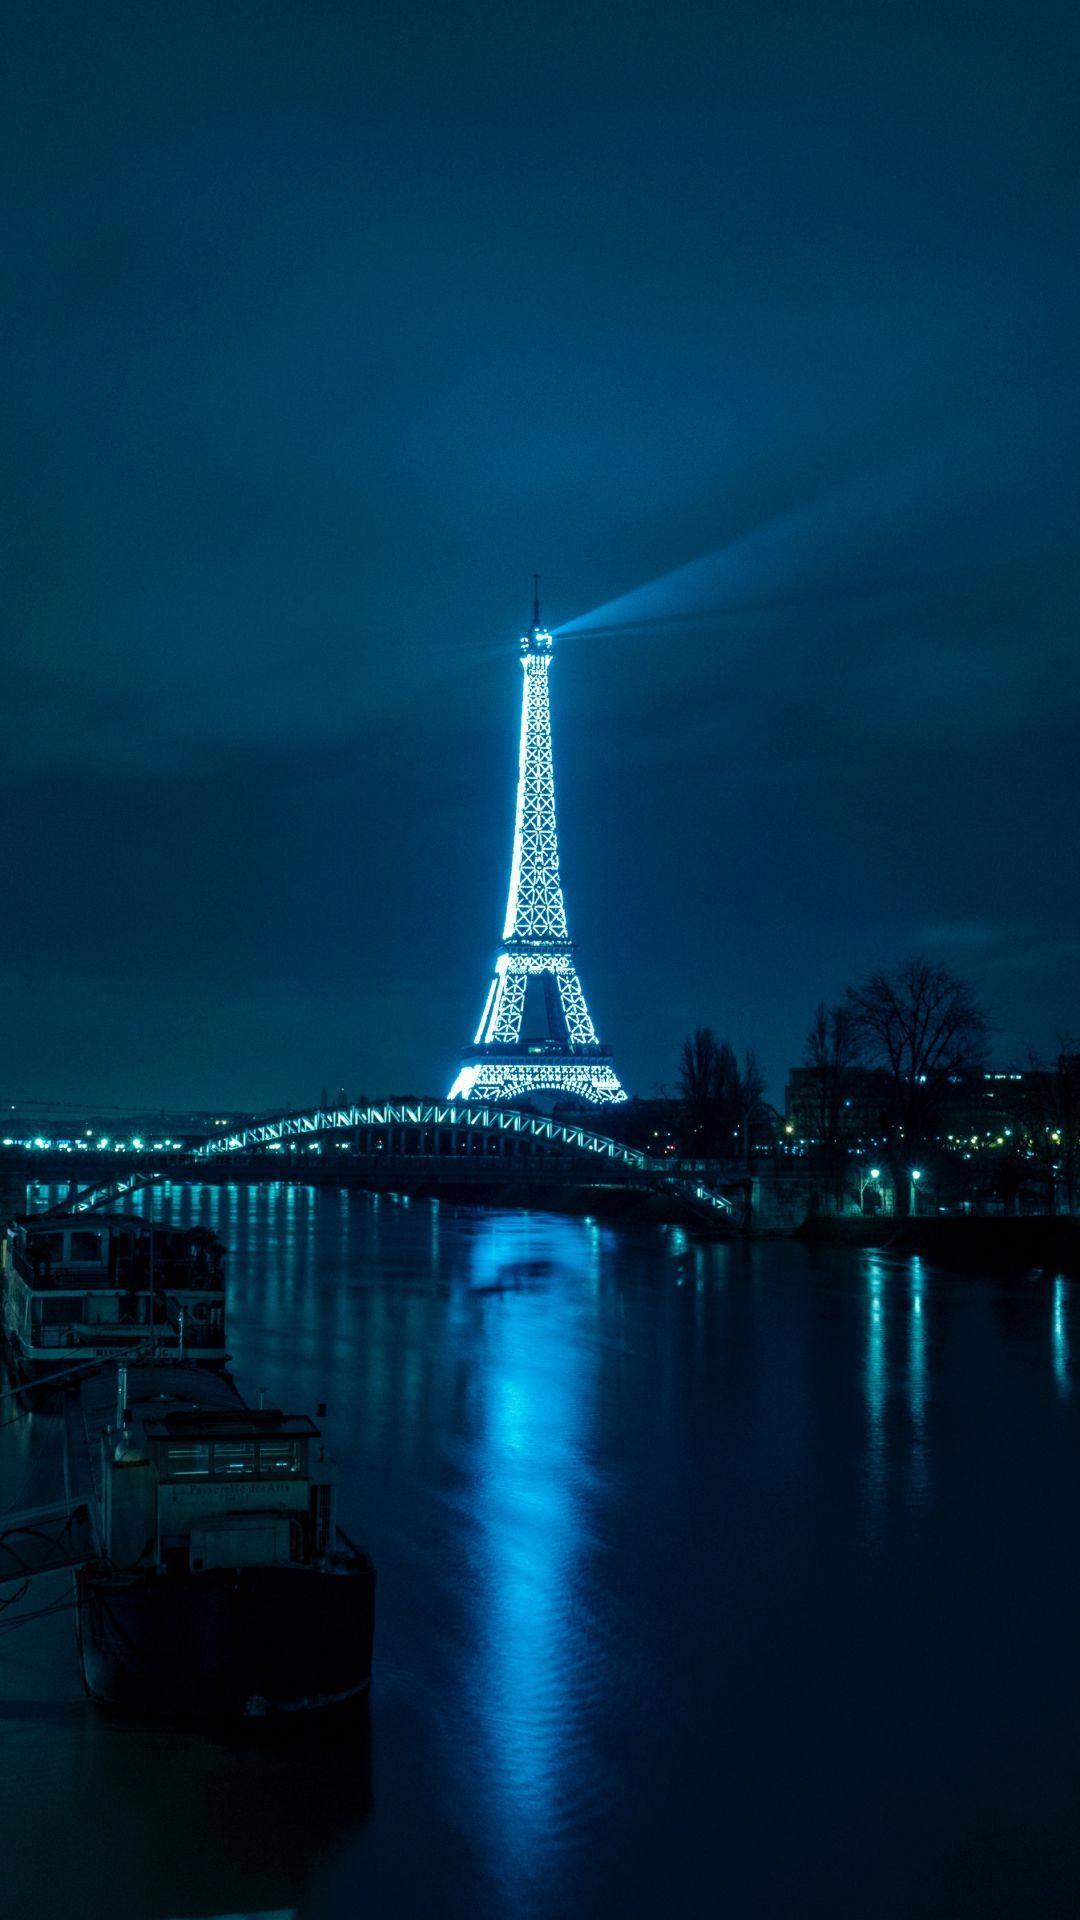 Paris At Night Wallpaper Iphone